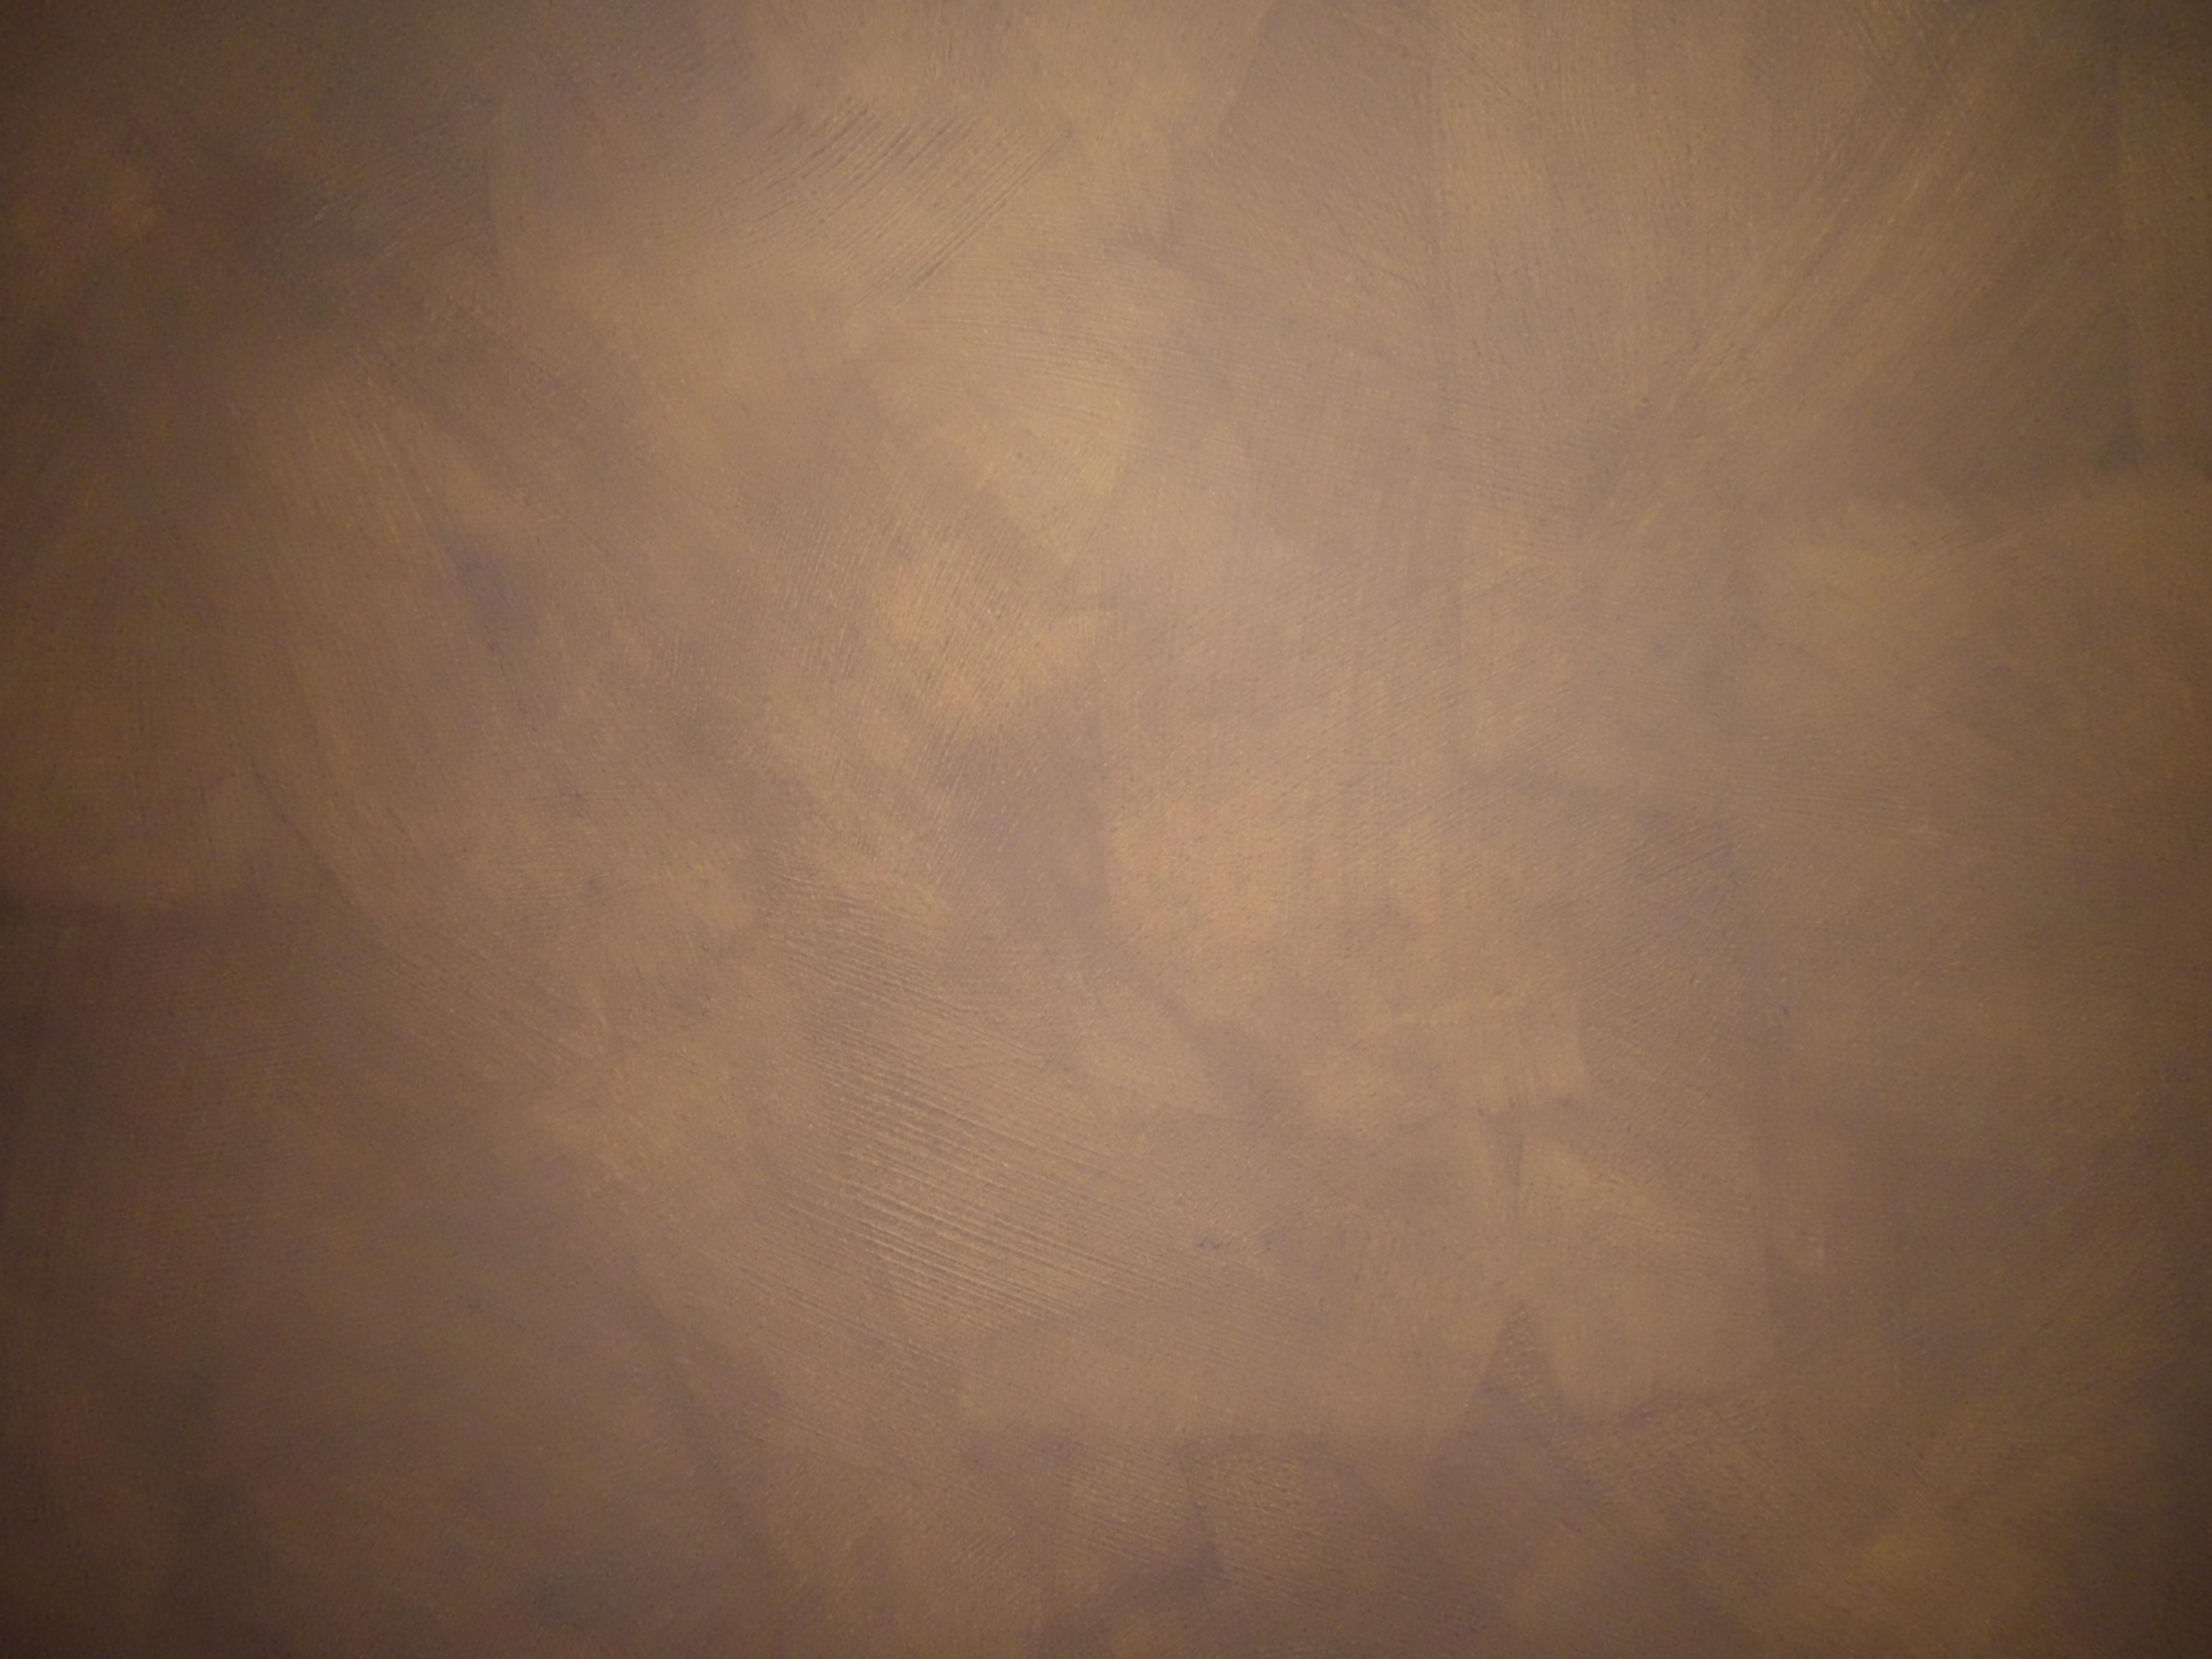 20170324 185812 ikea volledige badkamer - Deco originele muur ...